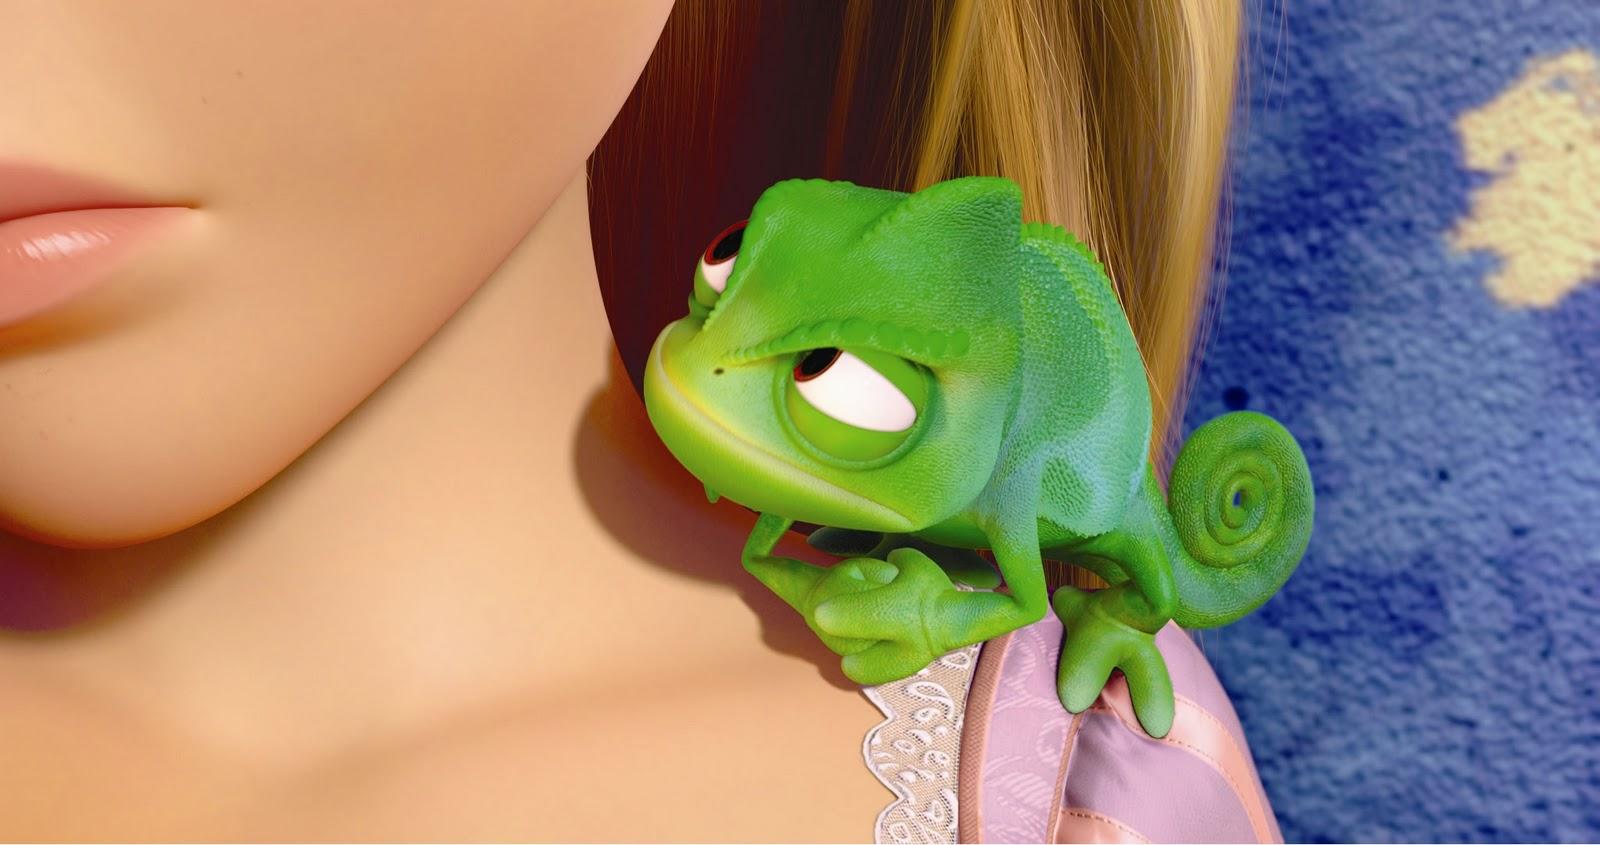 http://2.bp.blogspot.com/_f-C3WQlZuQA/TTZJYKQPTuI/AAAAAAAAACg/8W0VnE9ODq0/s1600/tangled-pascal-chameleon-wallpaper-6.jpg